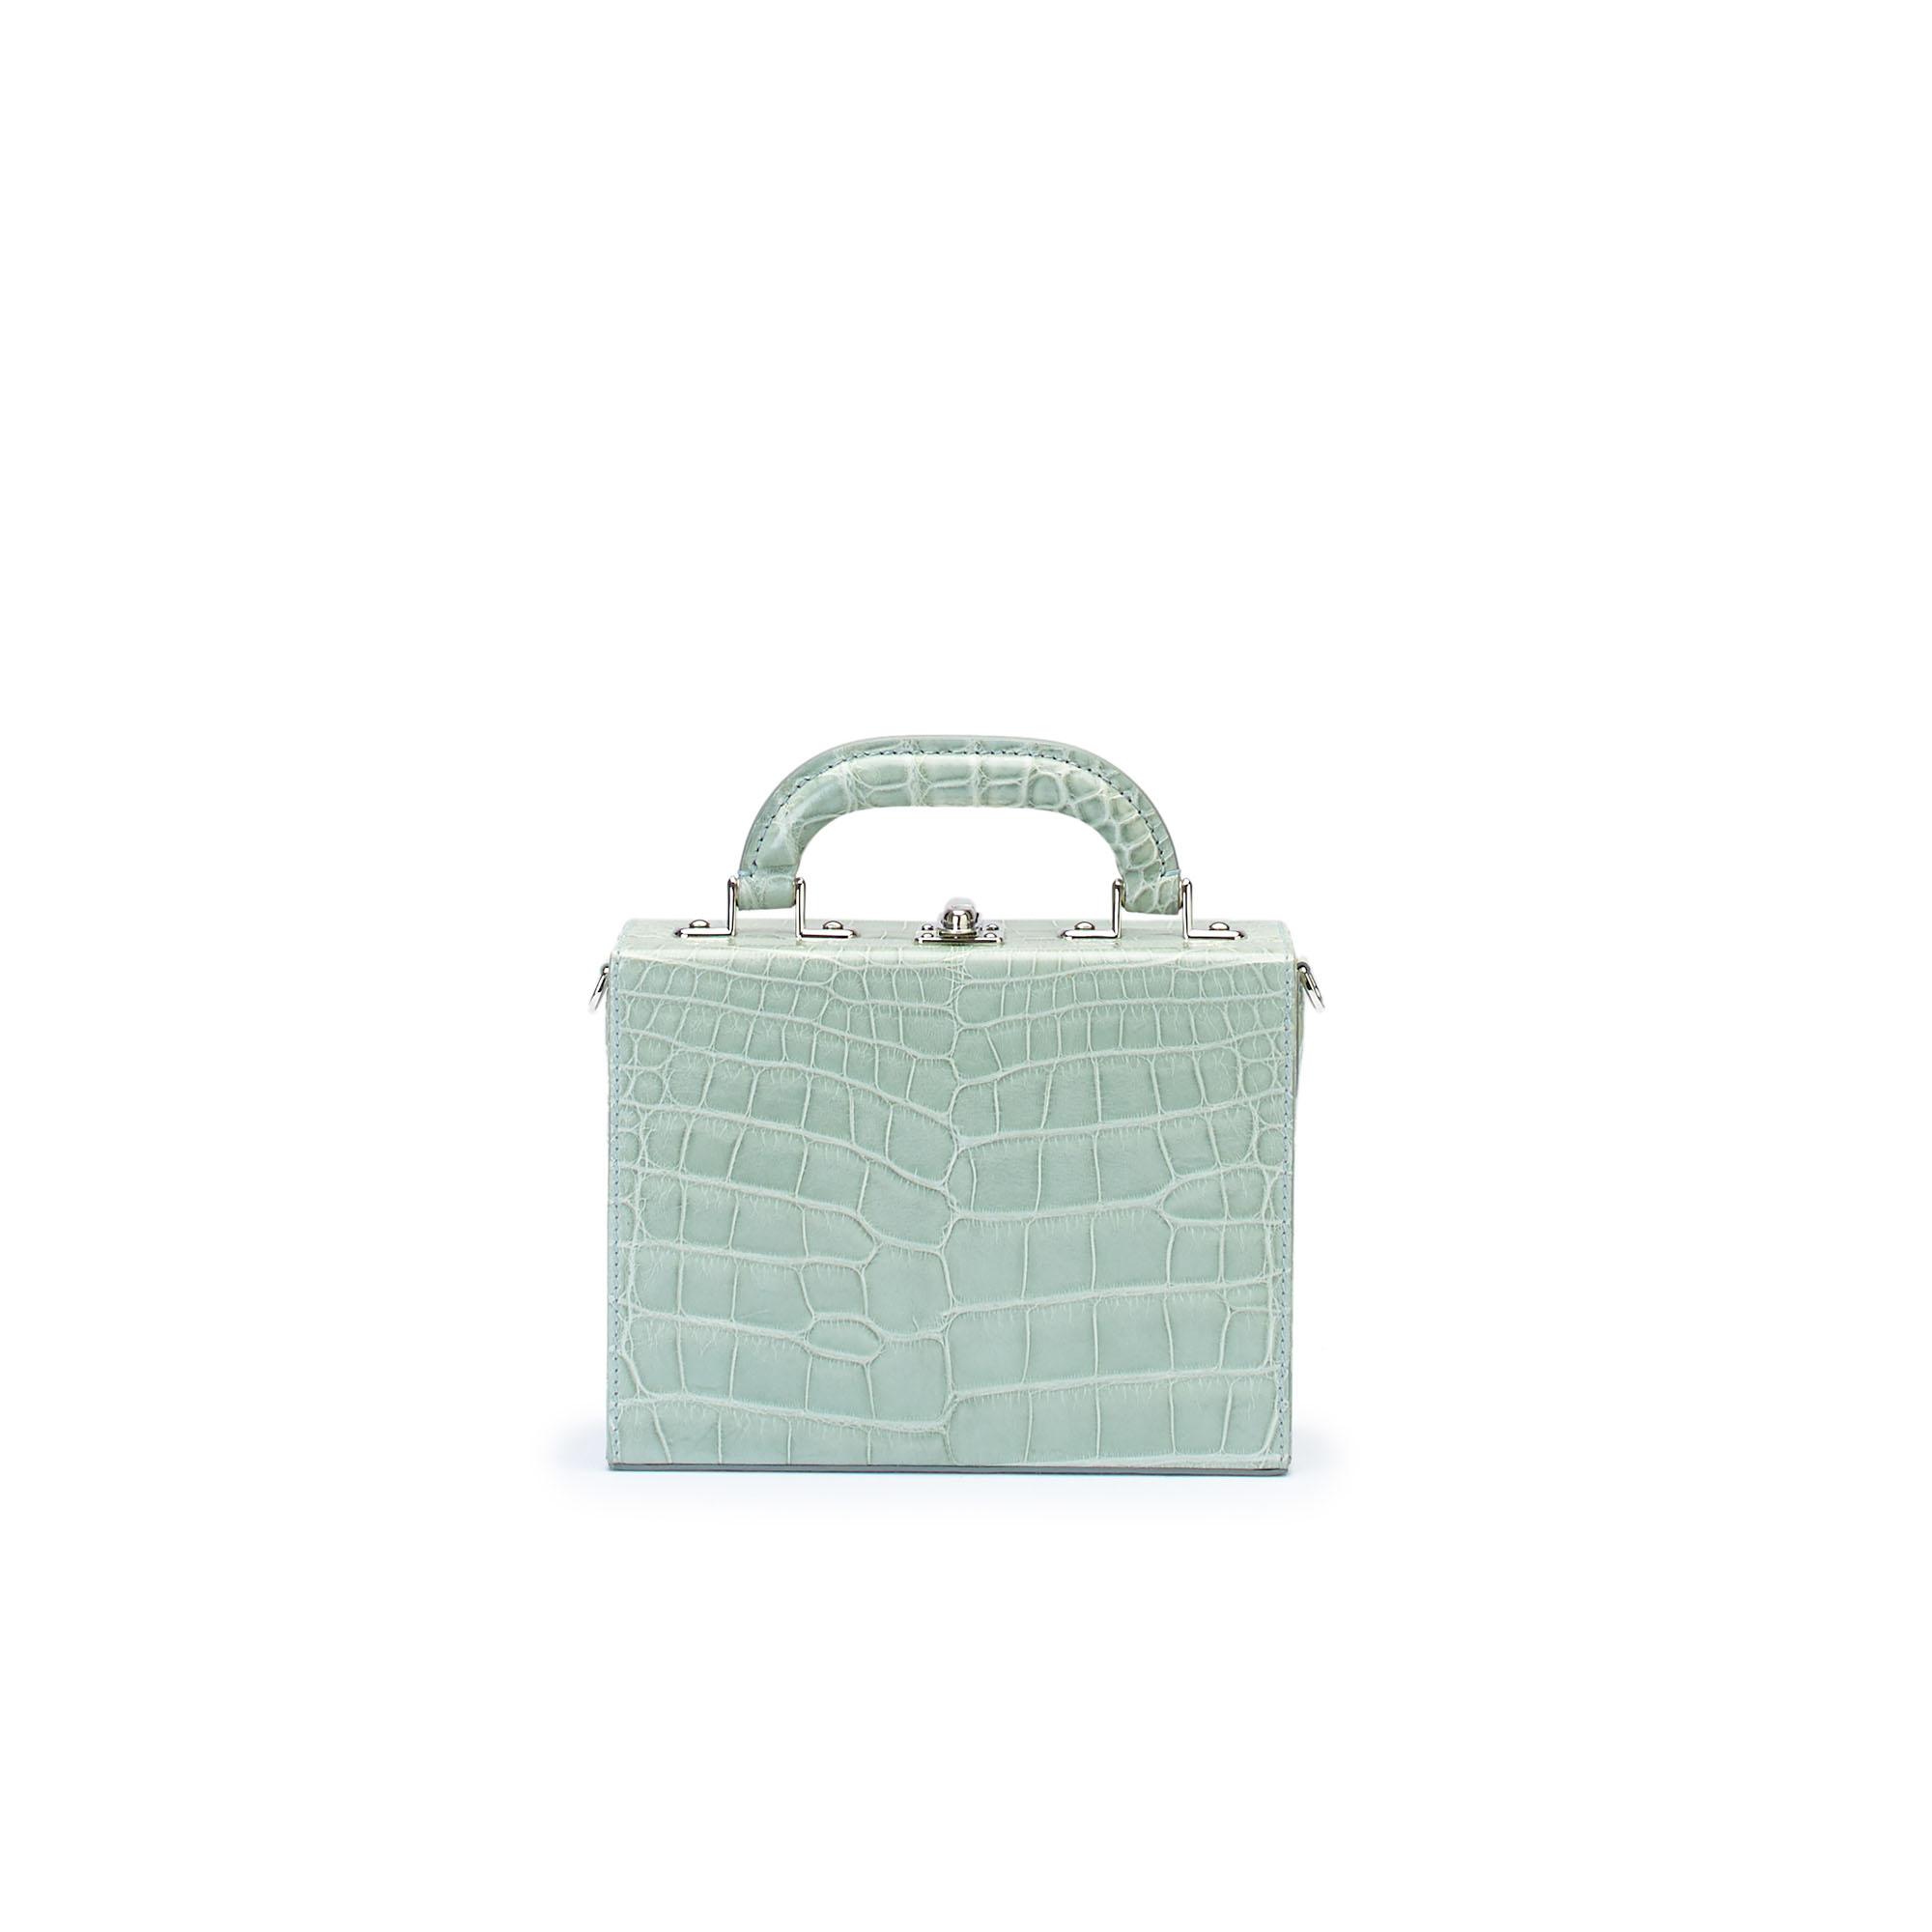 The seafoam green alligator Squared Bertoncina suitcase by Bertoni 1949 01